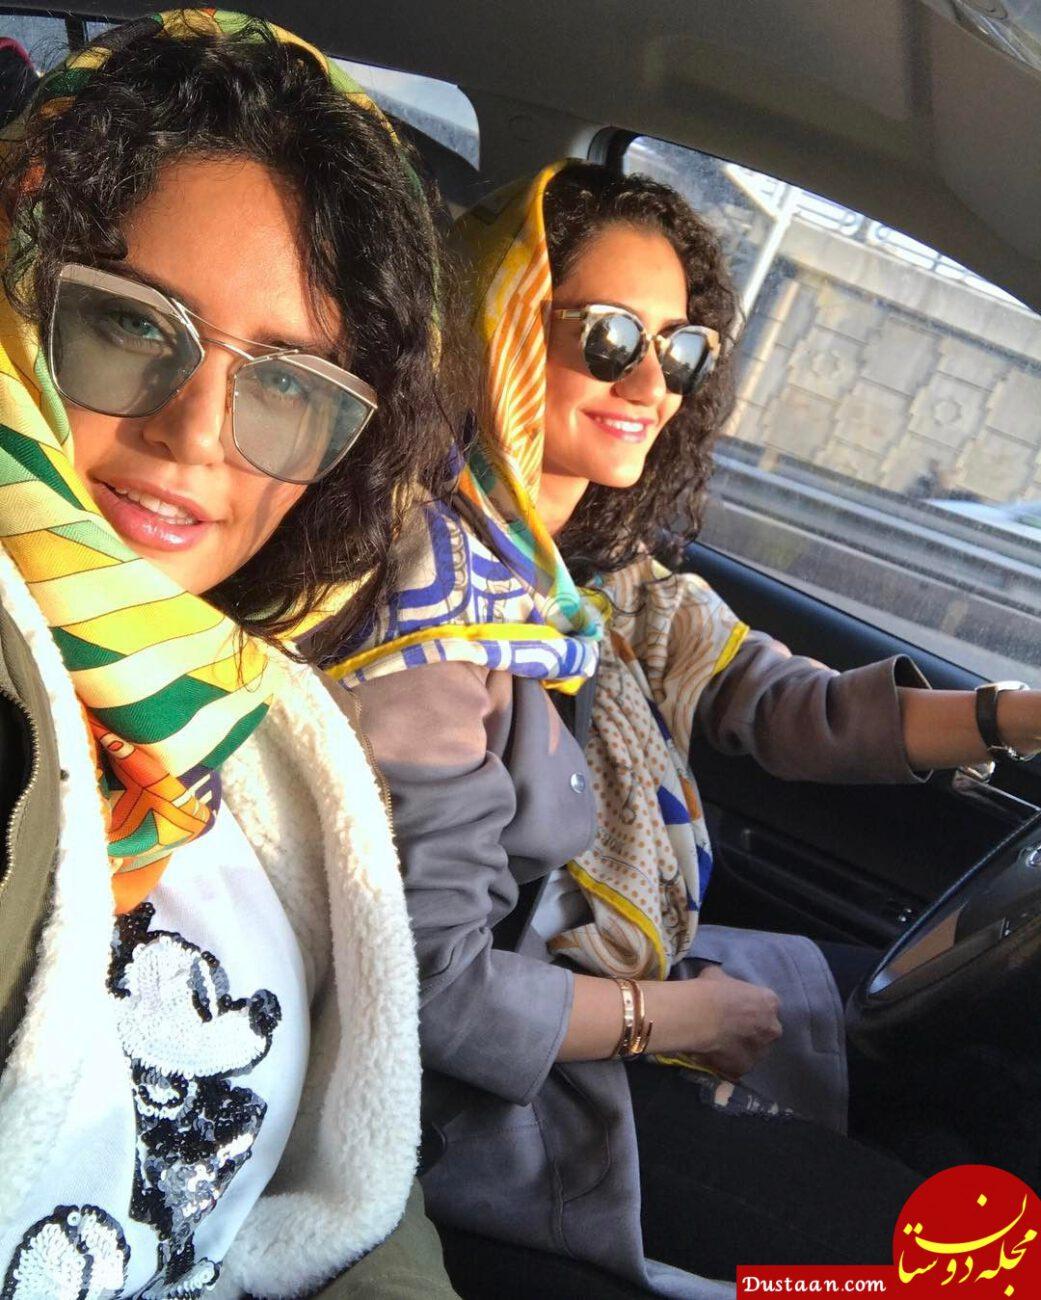 www.dustaan.com بیوگرافی و عکس های جذاب الناز شاکردوست